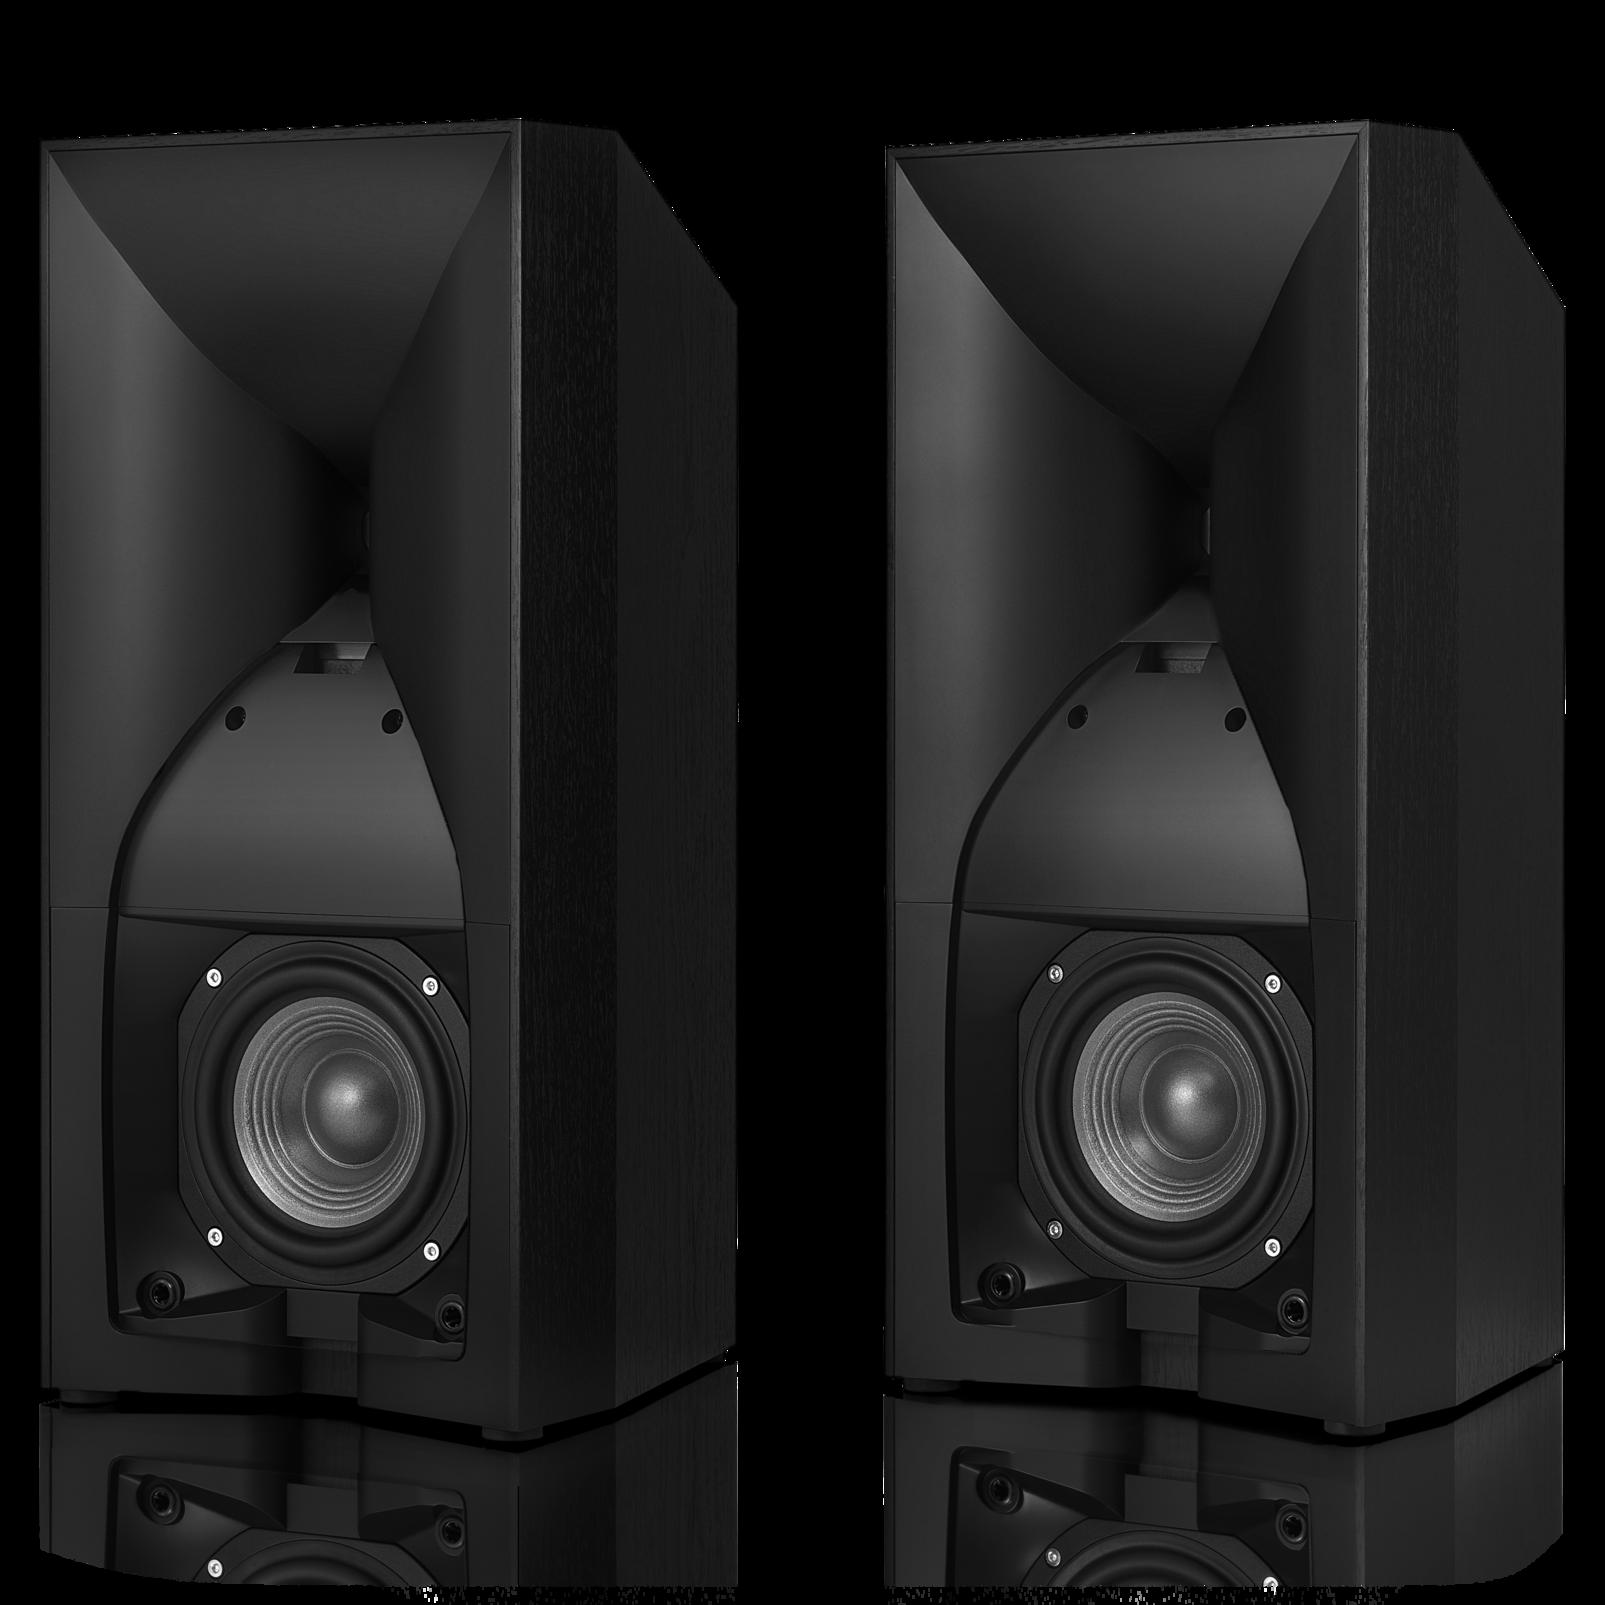 Studio 530 - Black - Professional-quality 125-watt Bookshelf Speakers - Detailshot 1